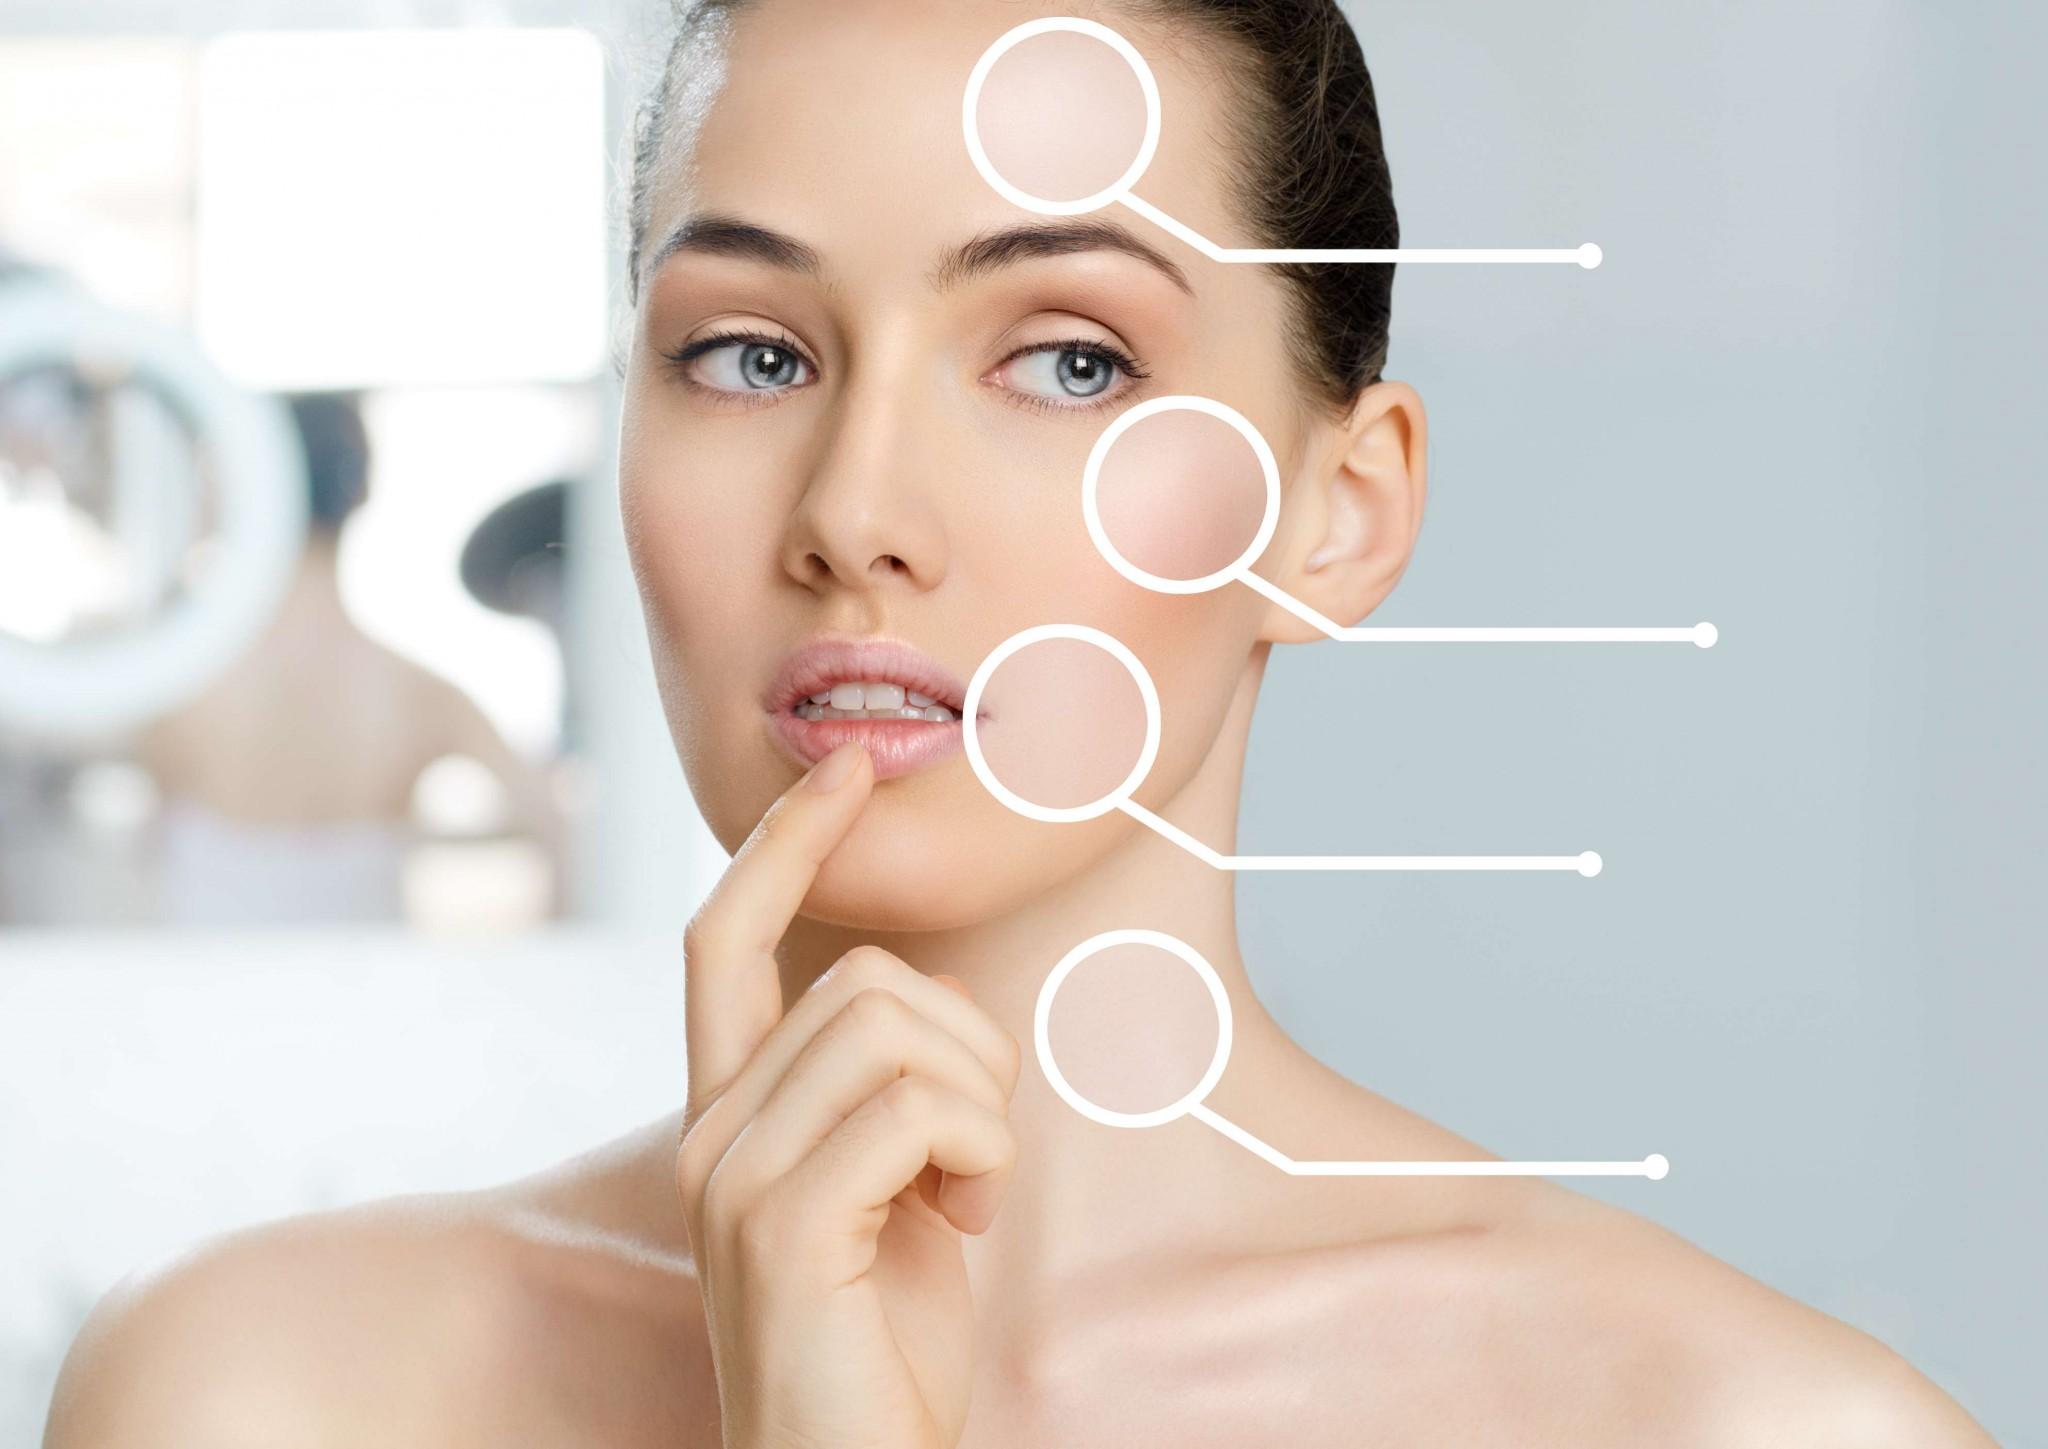 Cara merawat kulit rosak akibat merkuri